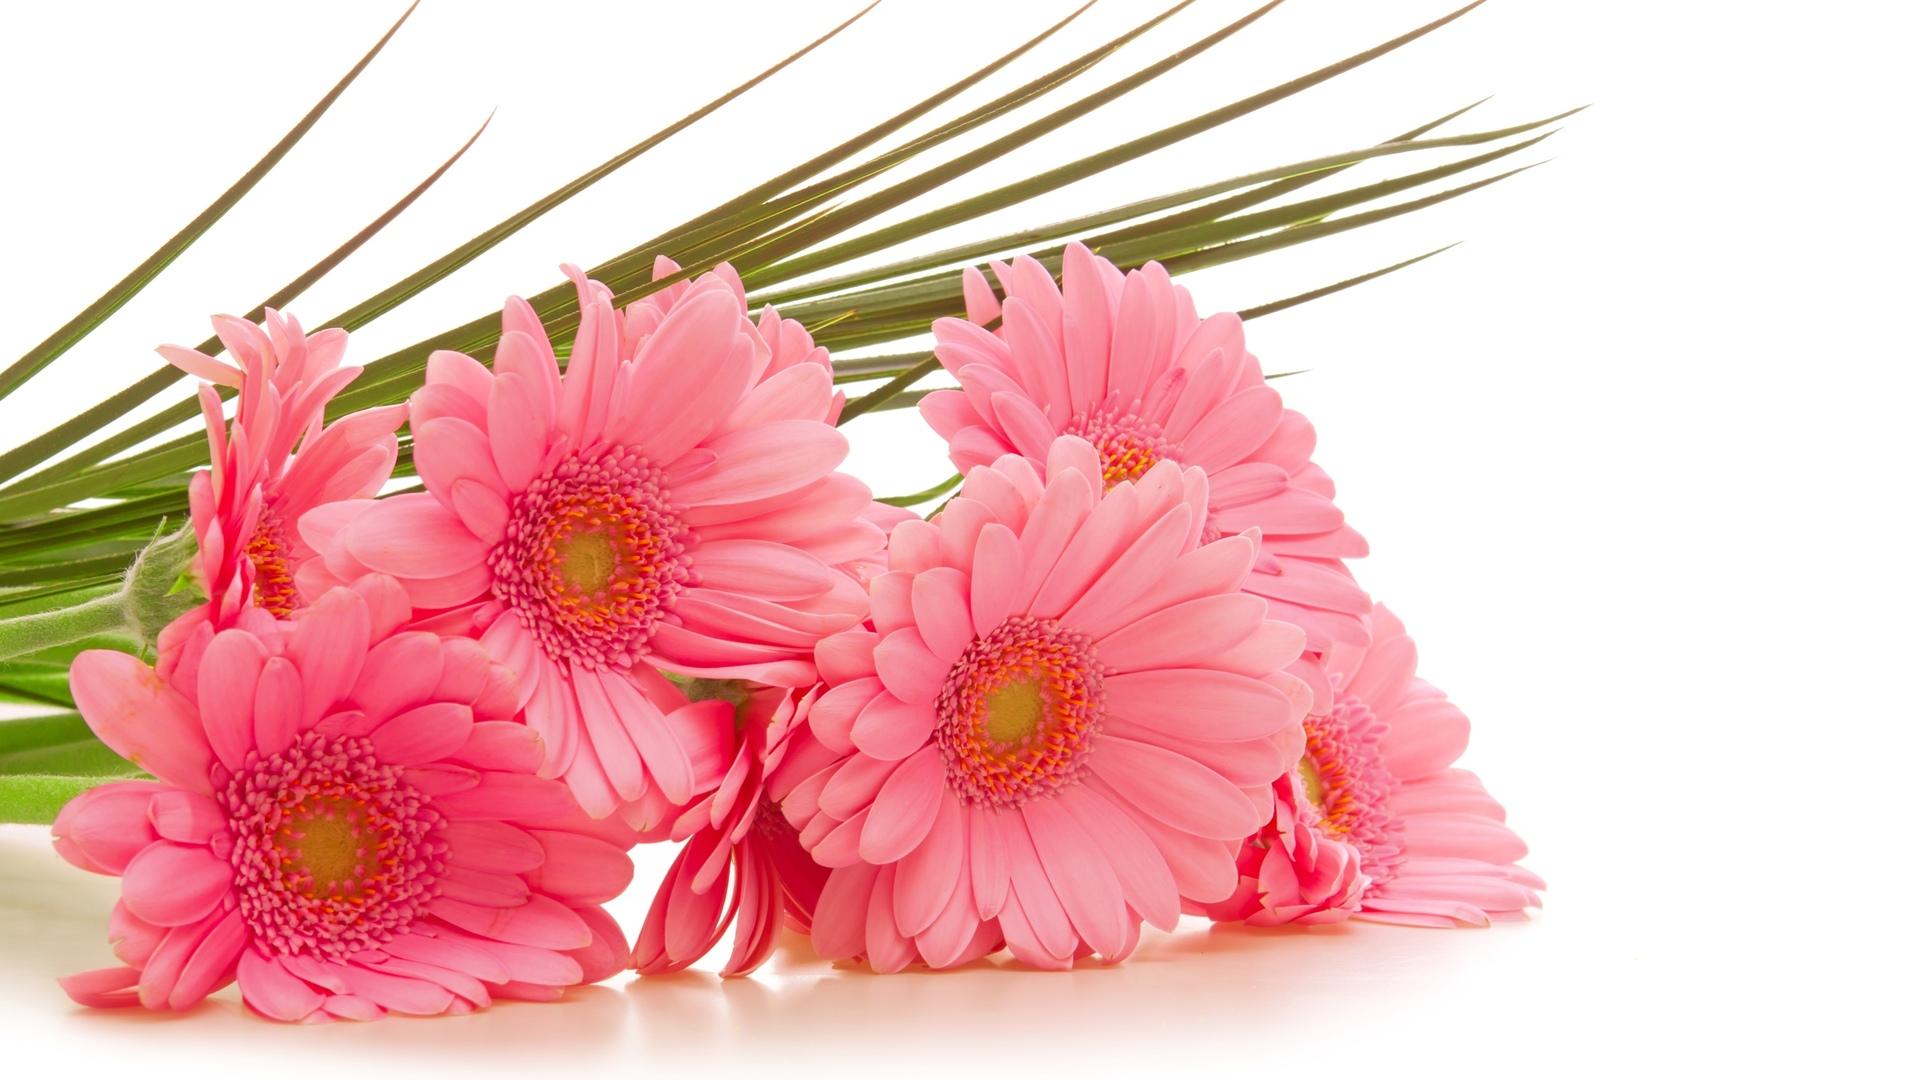 Цветы без фона